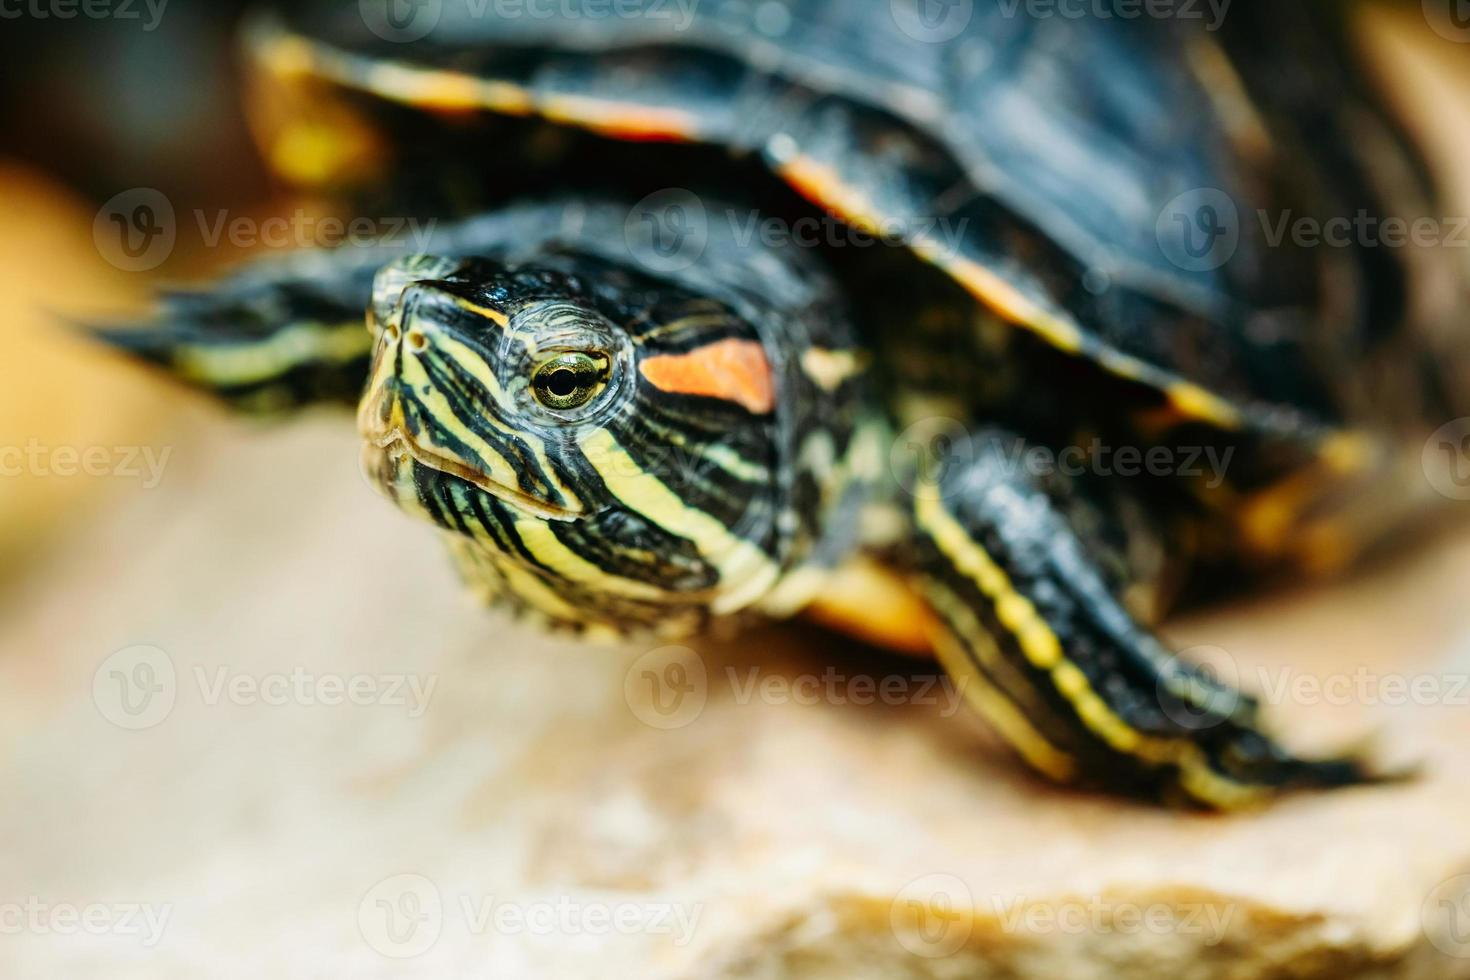 pequena tartaruga de orelha vermelha, lago terrapin foto